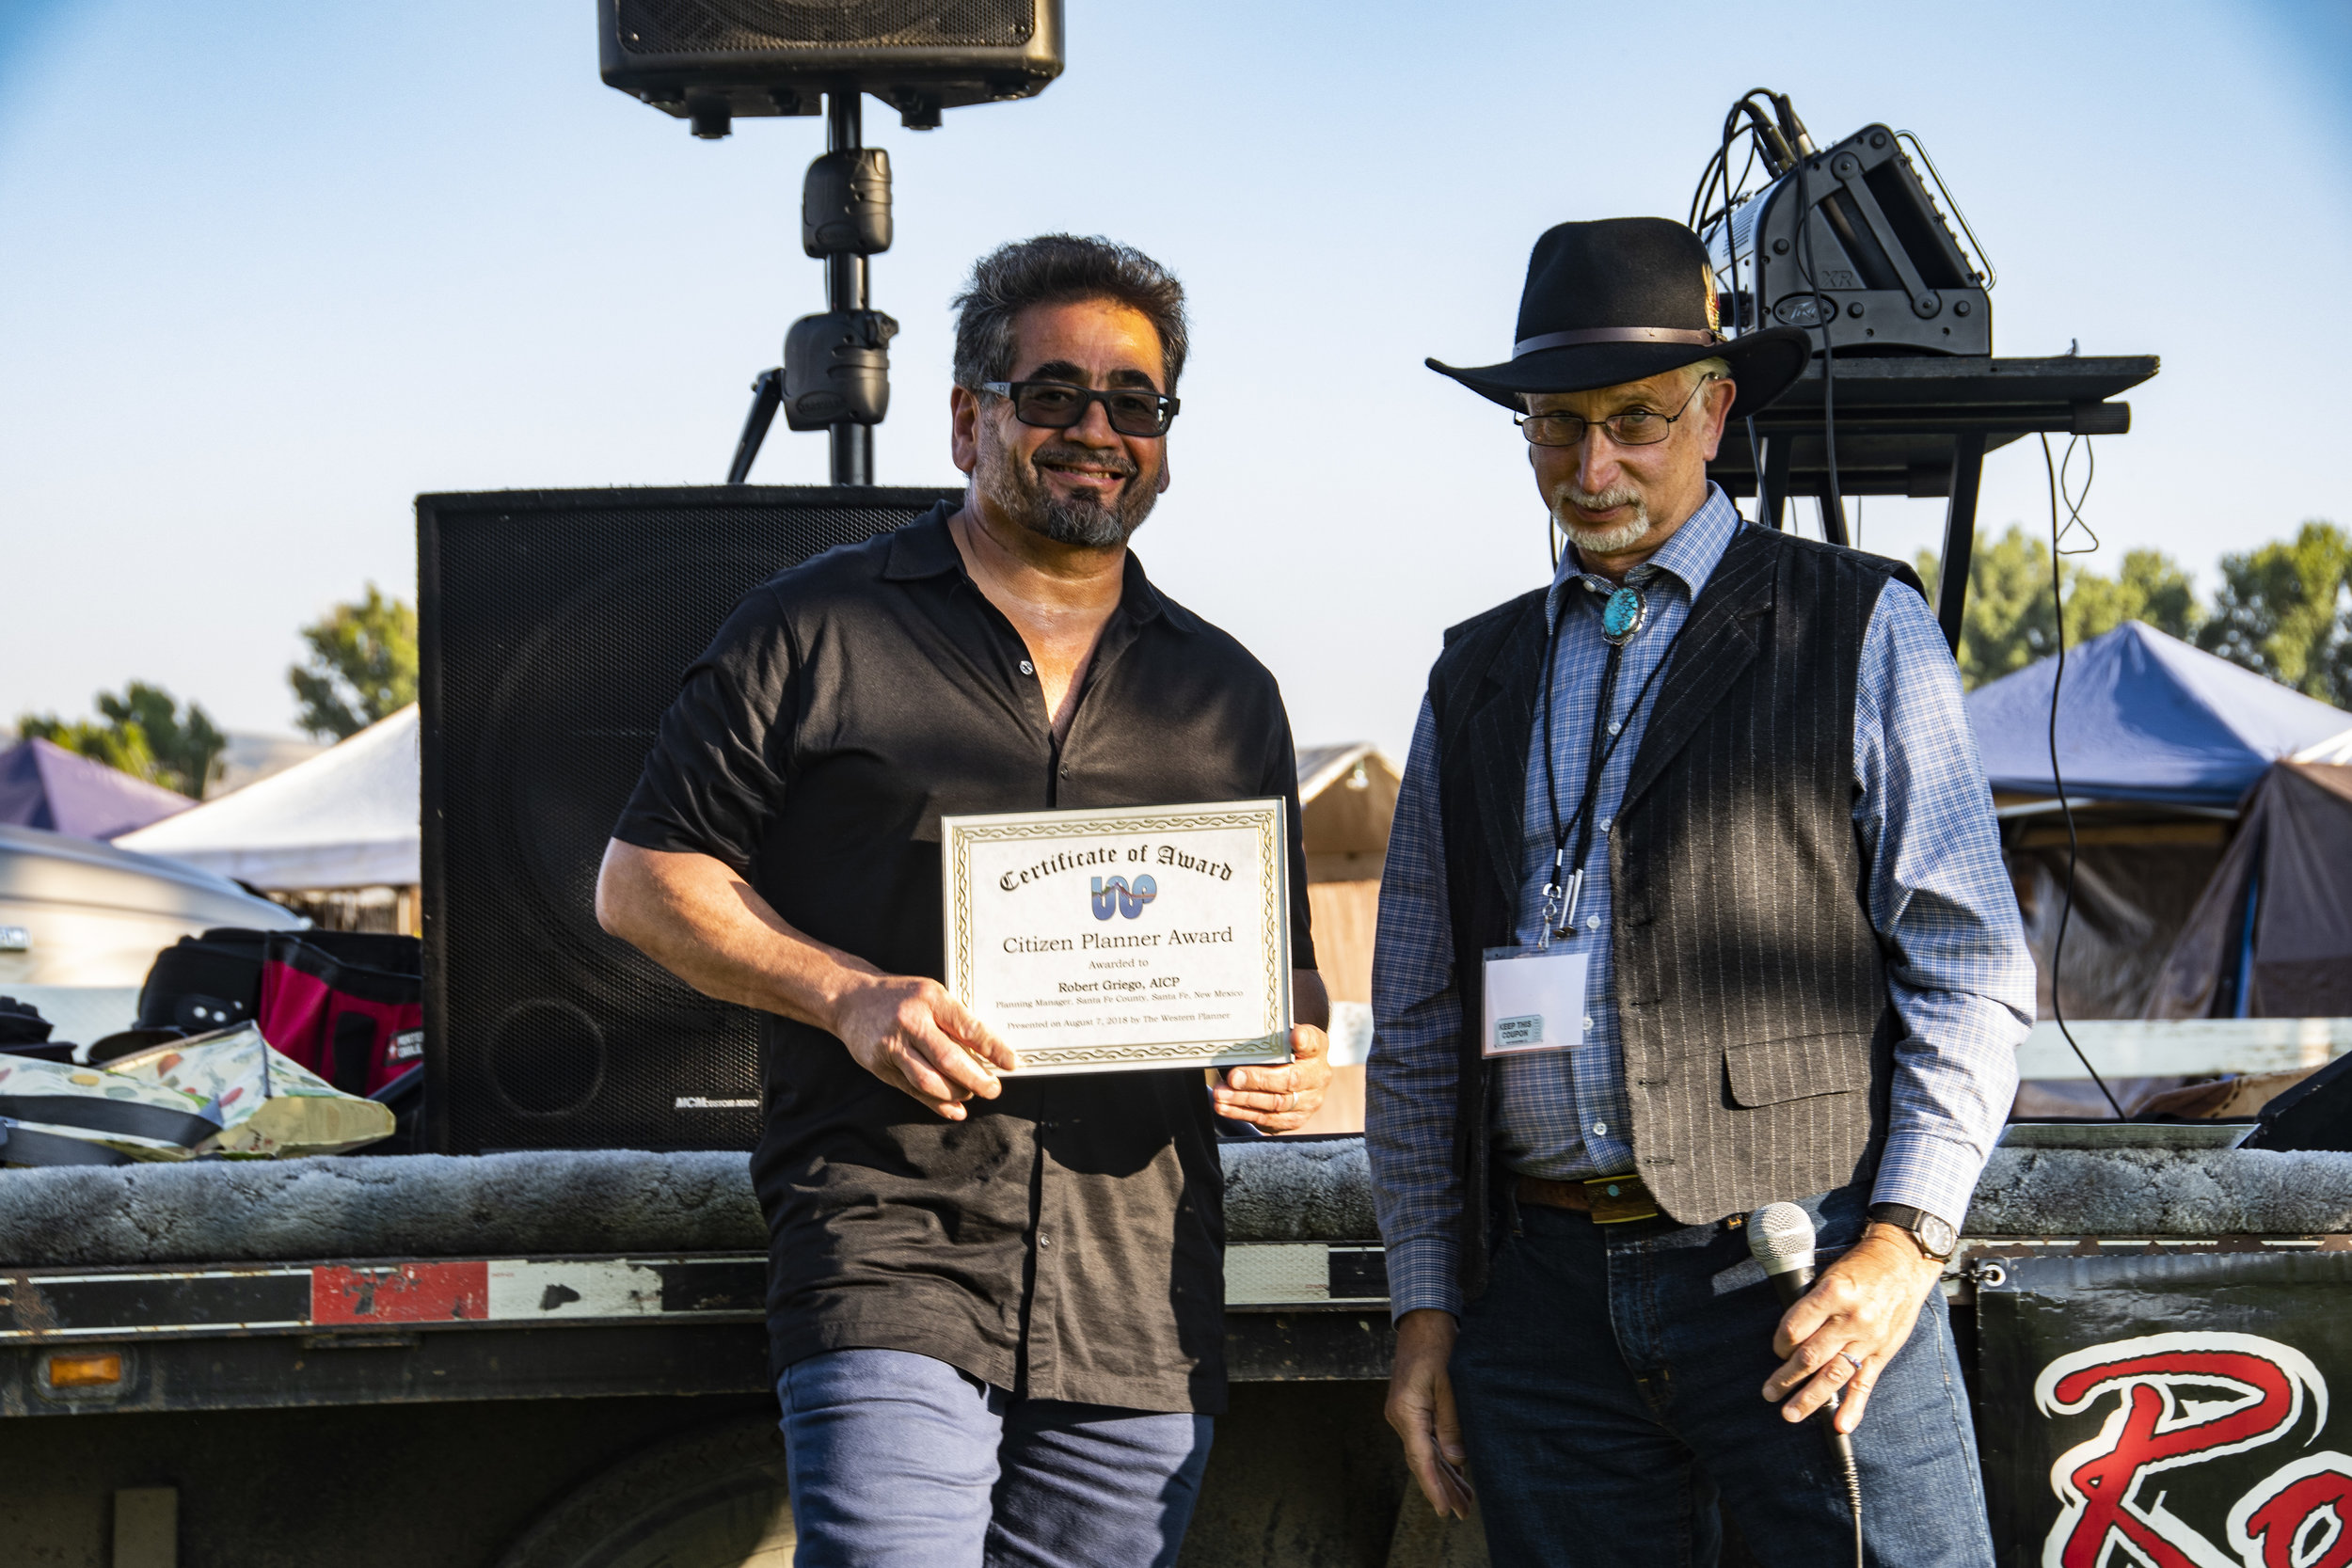 Robert Griego, AICP accepts award from Dan Pava, FAICP.